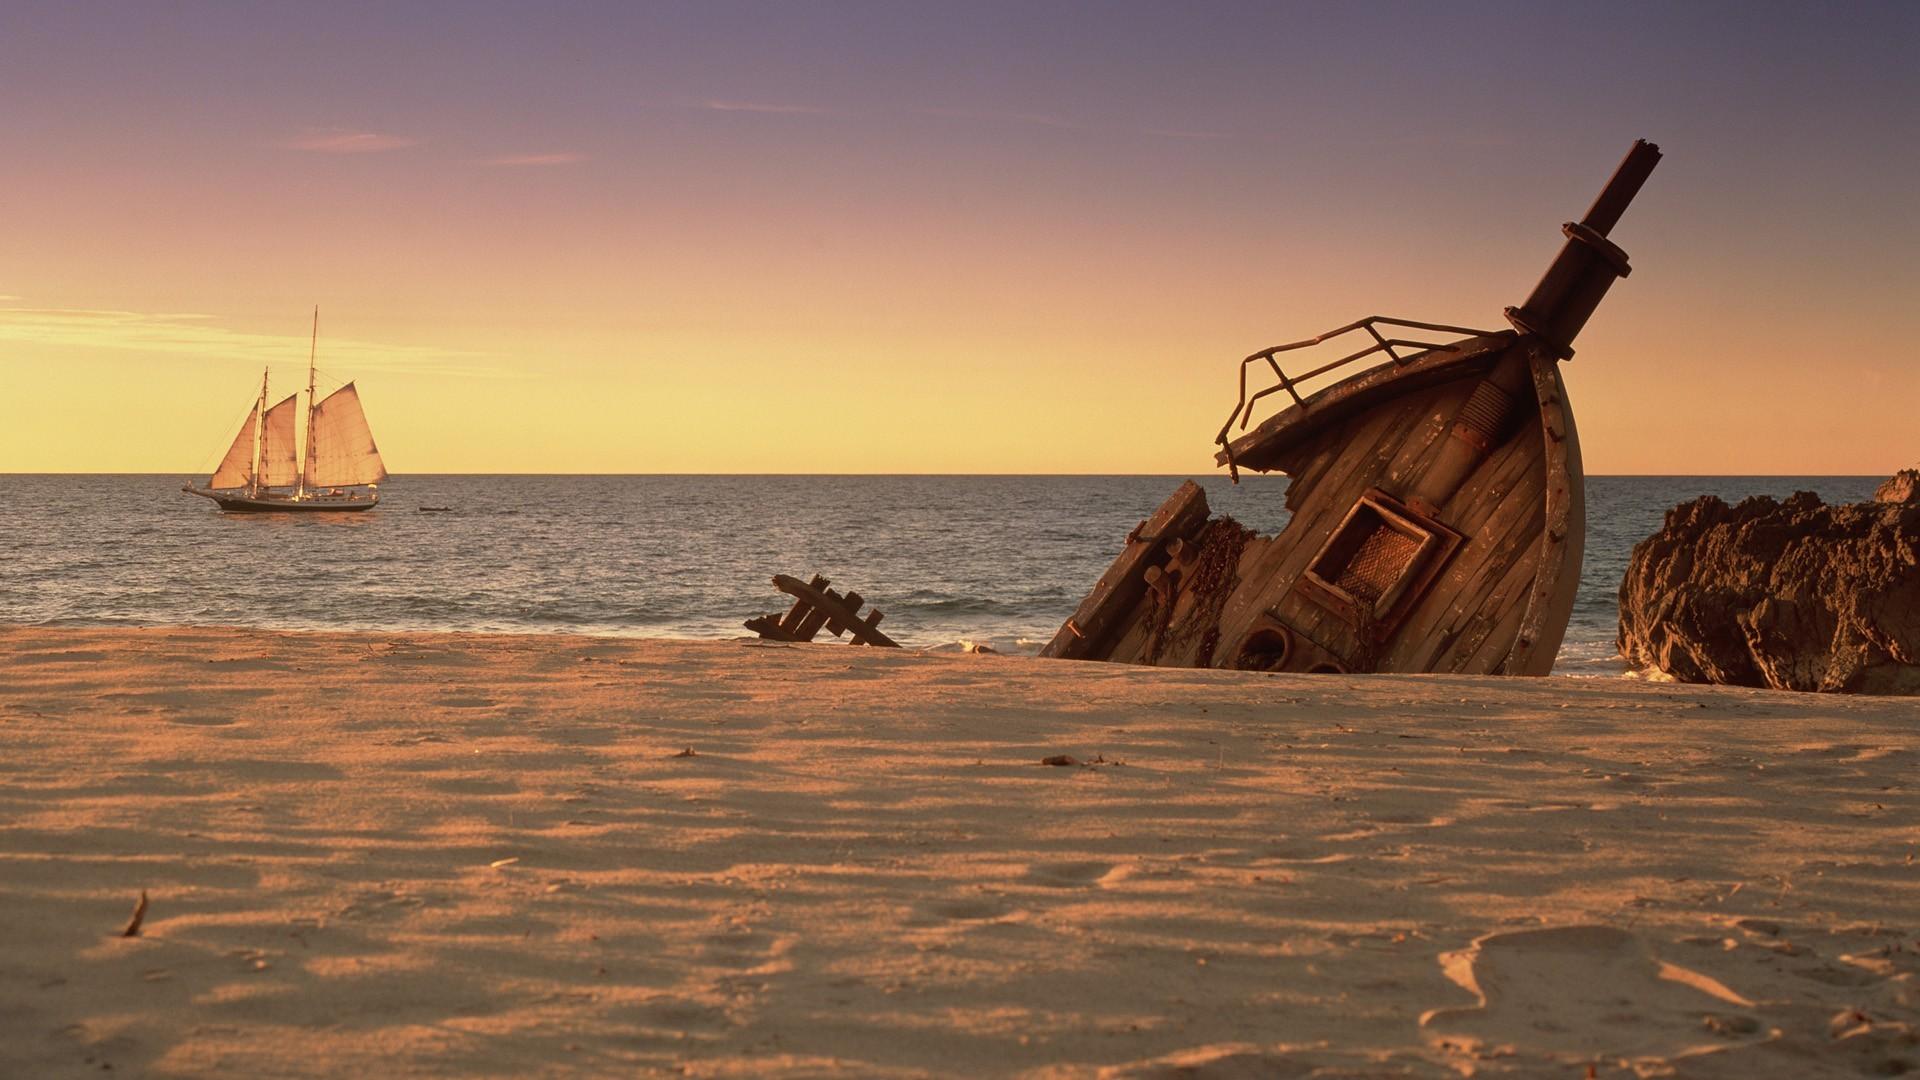 Картинки на рабочий стол море и острова приключения кораблекрушения